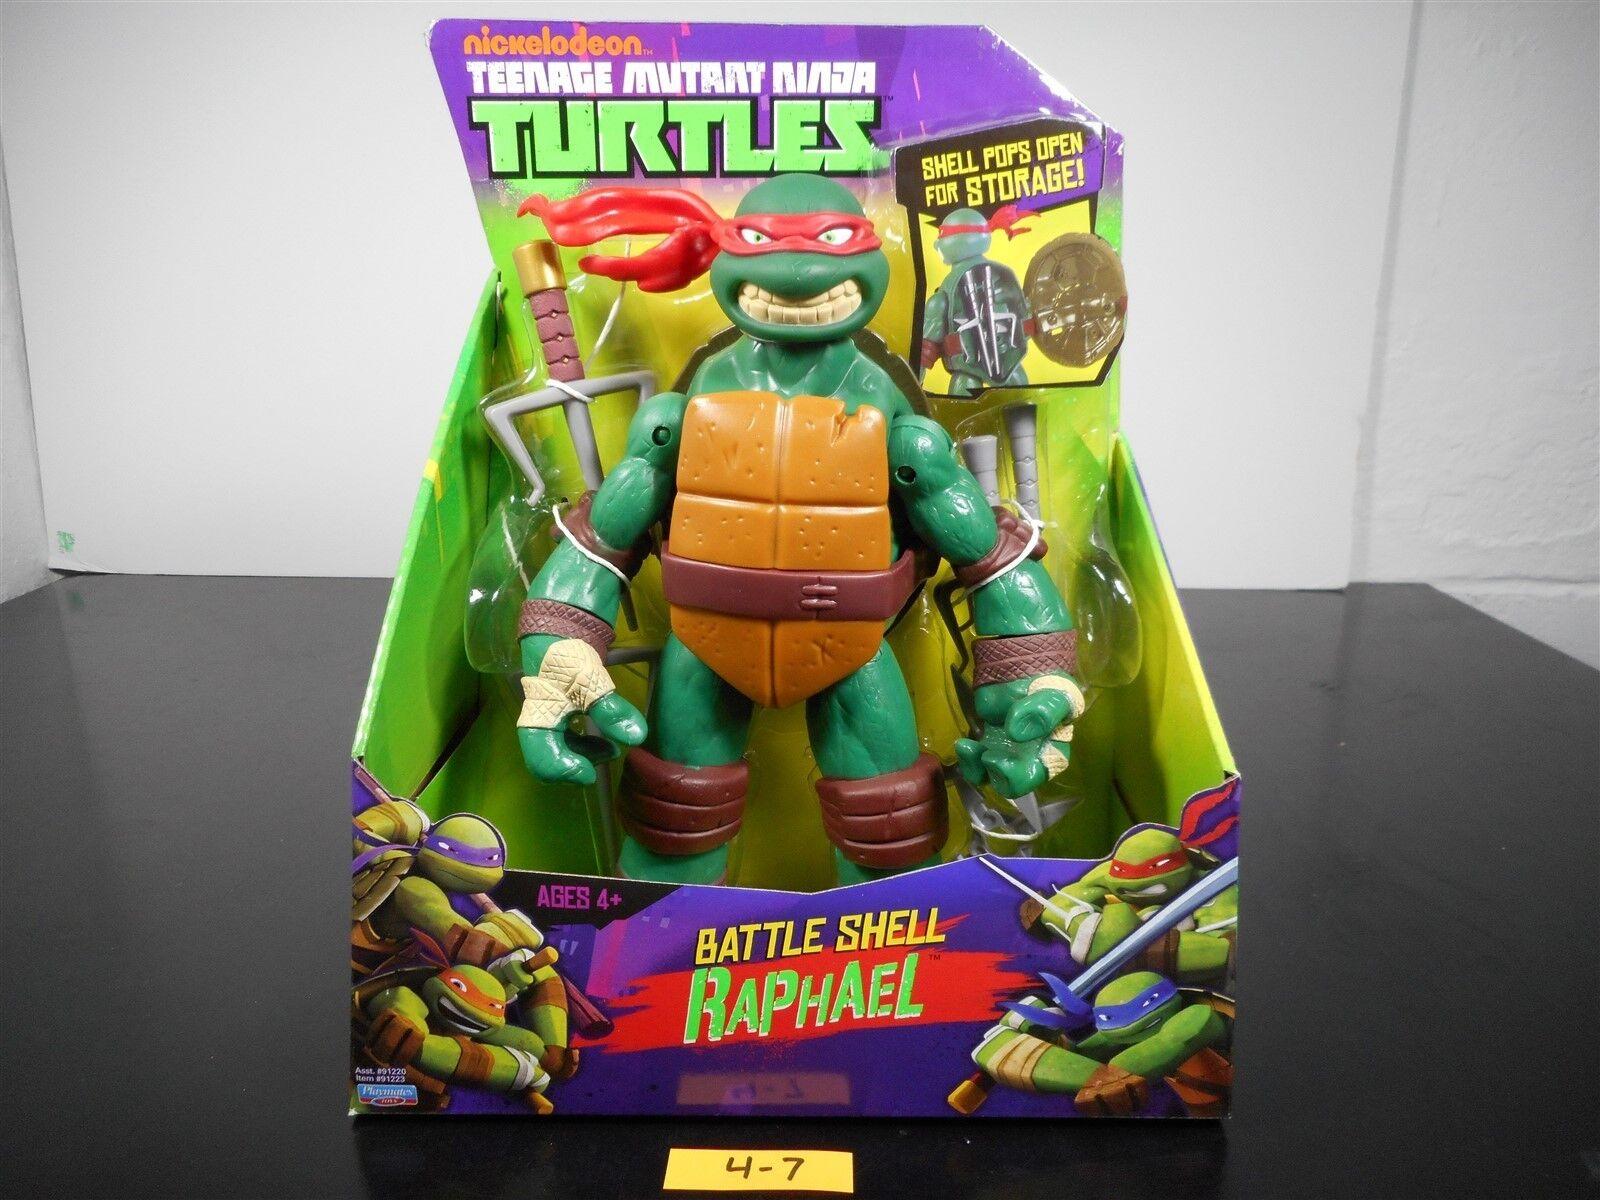 nuevo    Nickelodeon Teenage Mutant Ninja Turtles Battle Shell Raphael Raph 4-7